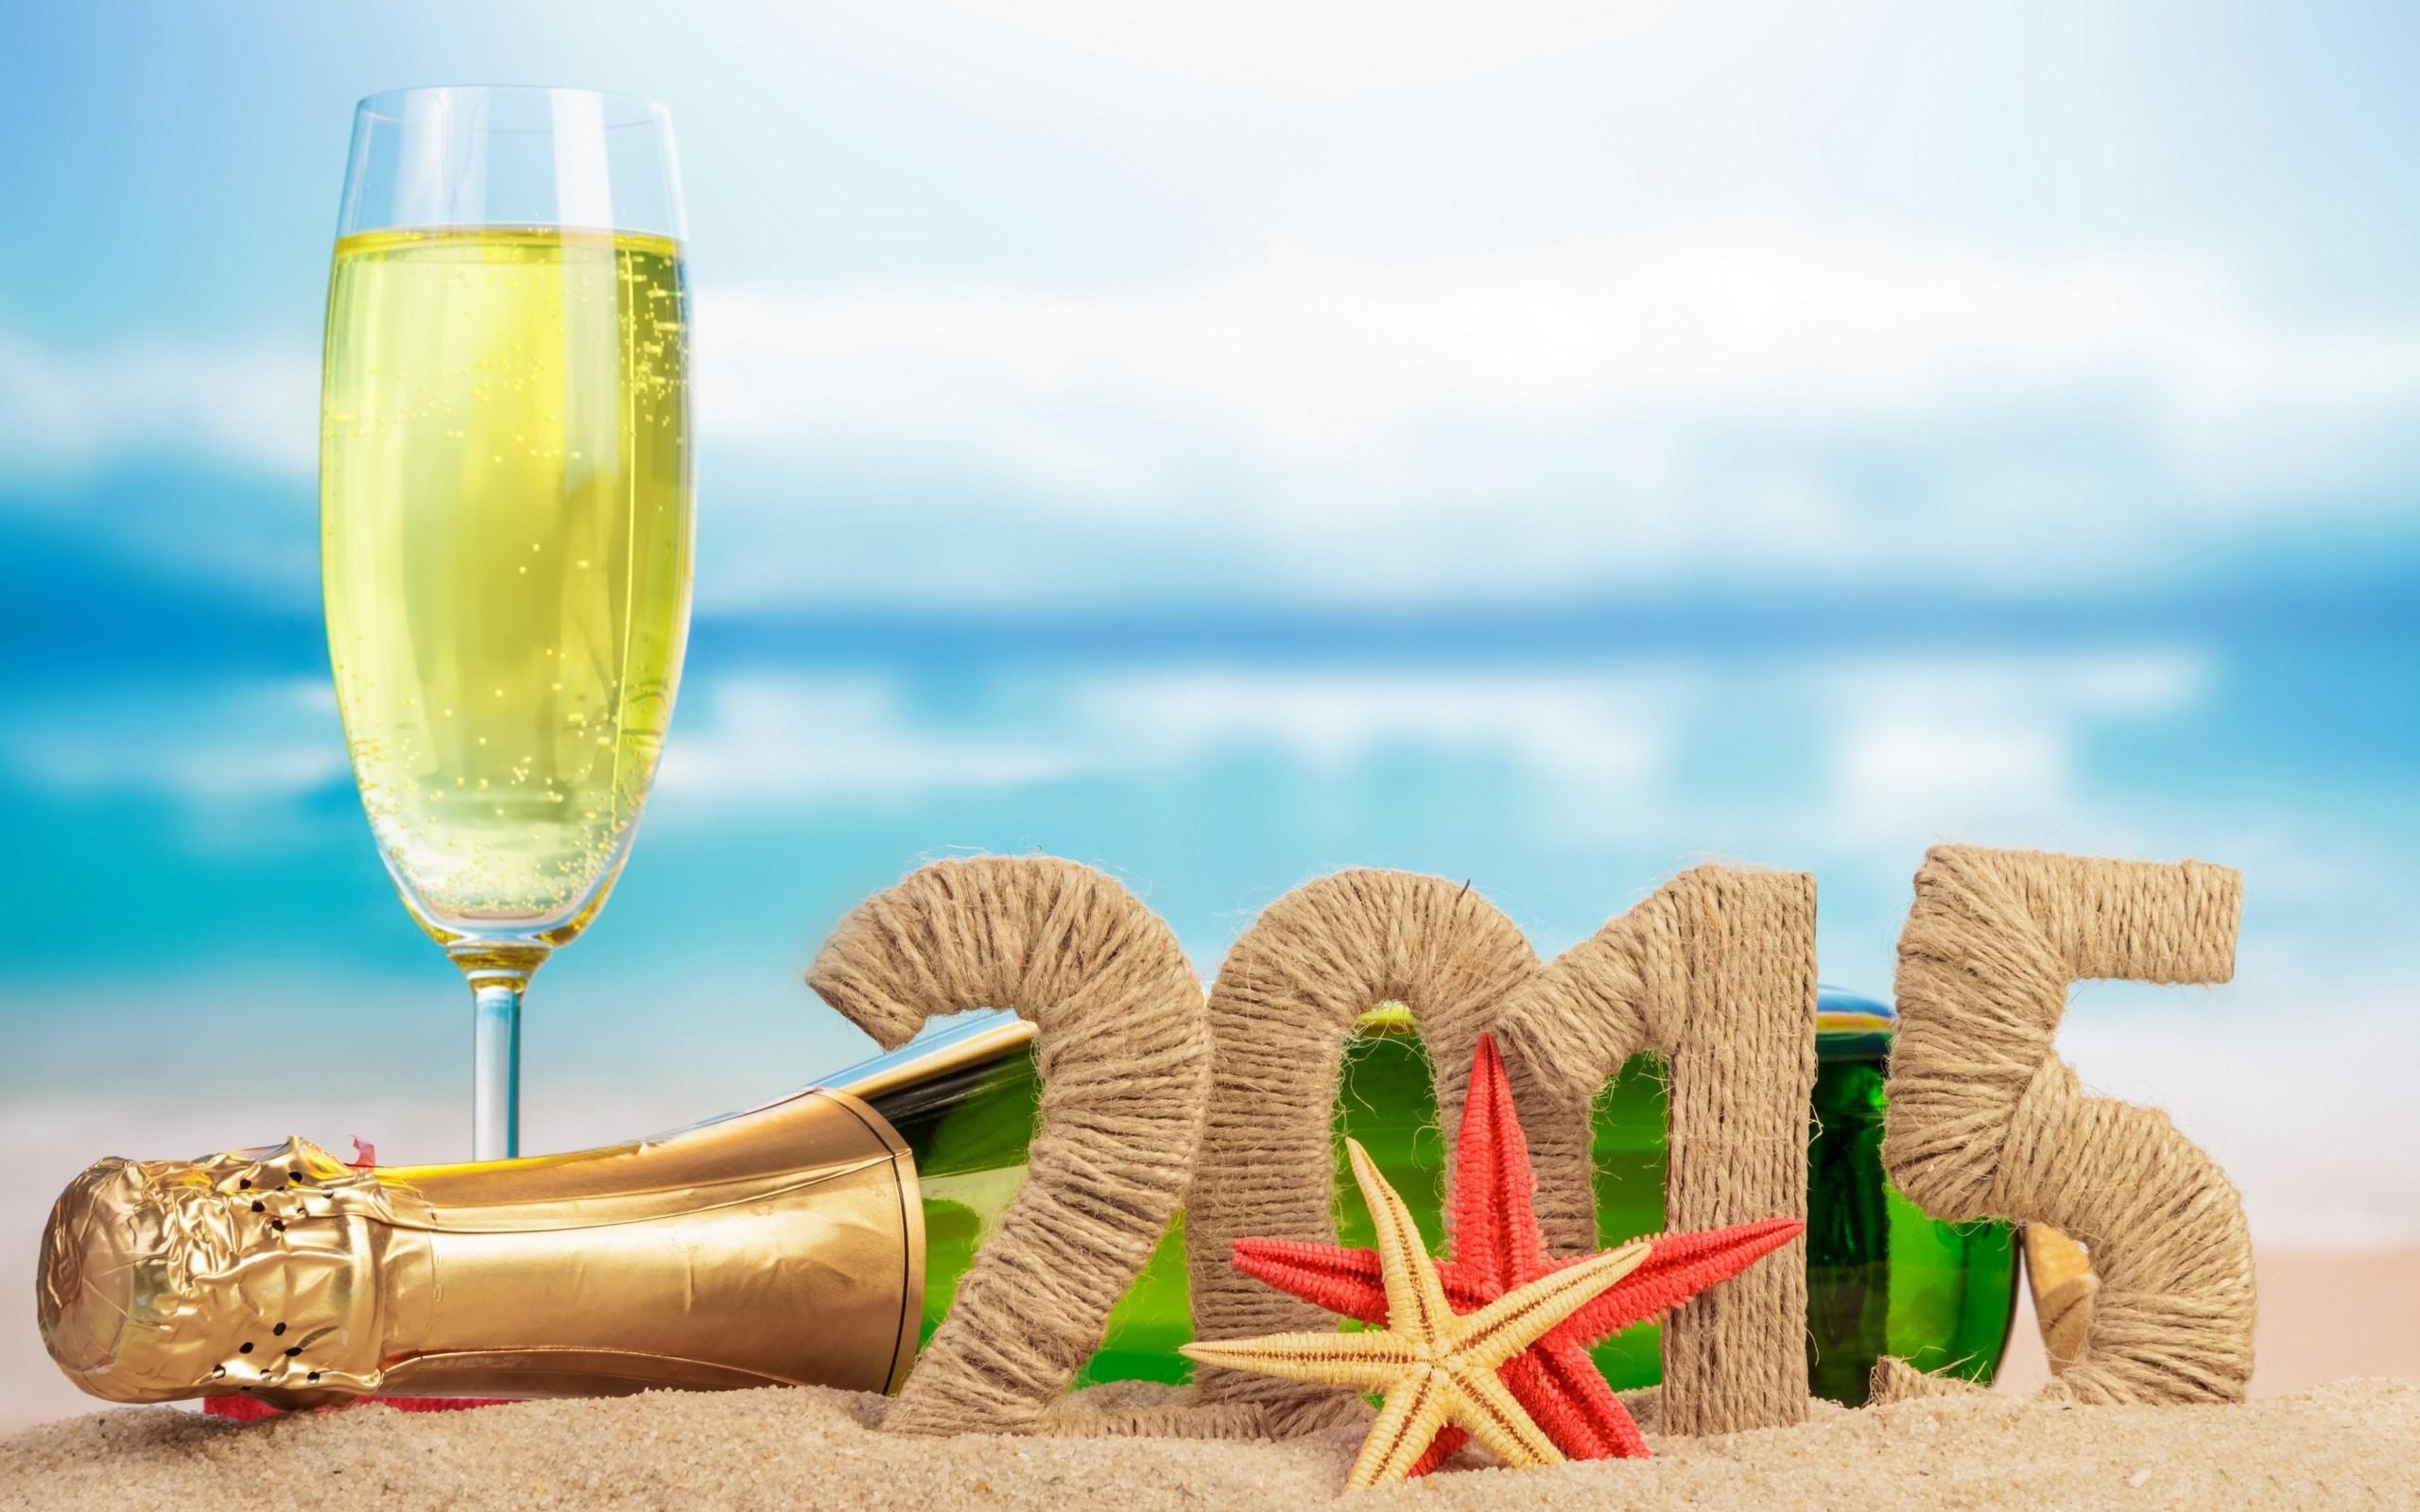 Happy New Year Beach 2015 Wallpaper Champagne